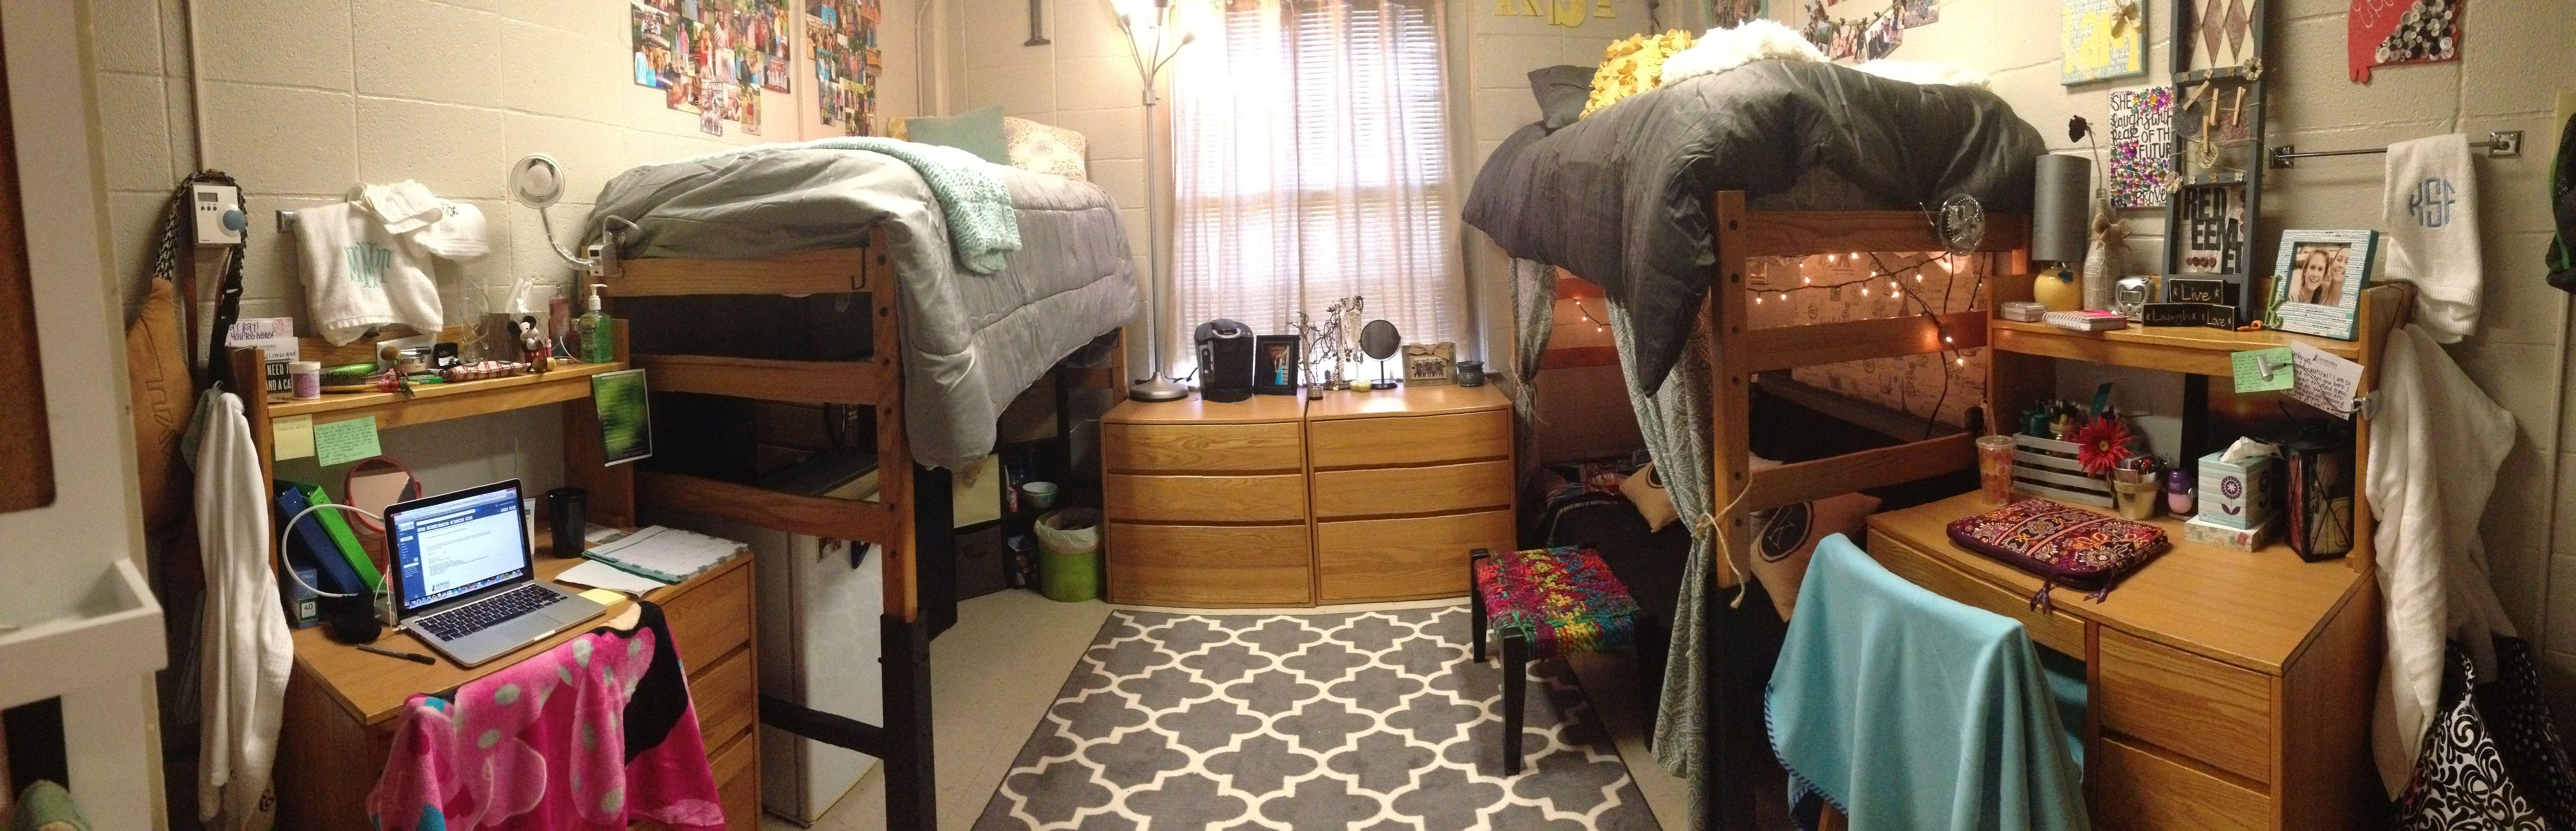 Samford University Vail Dorm Room Layout